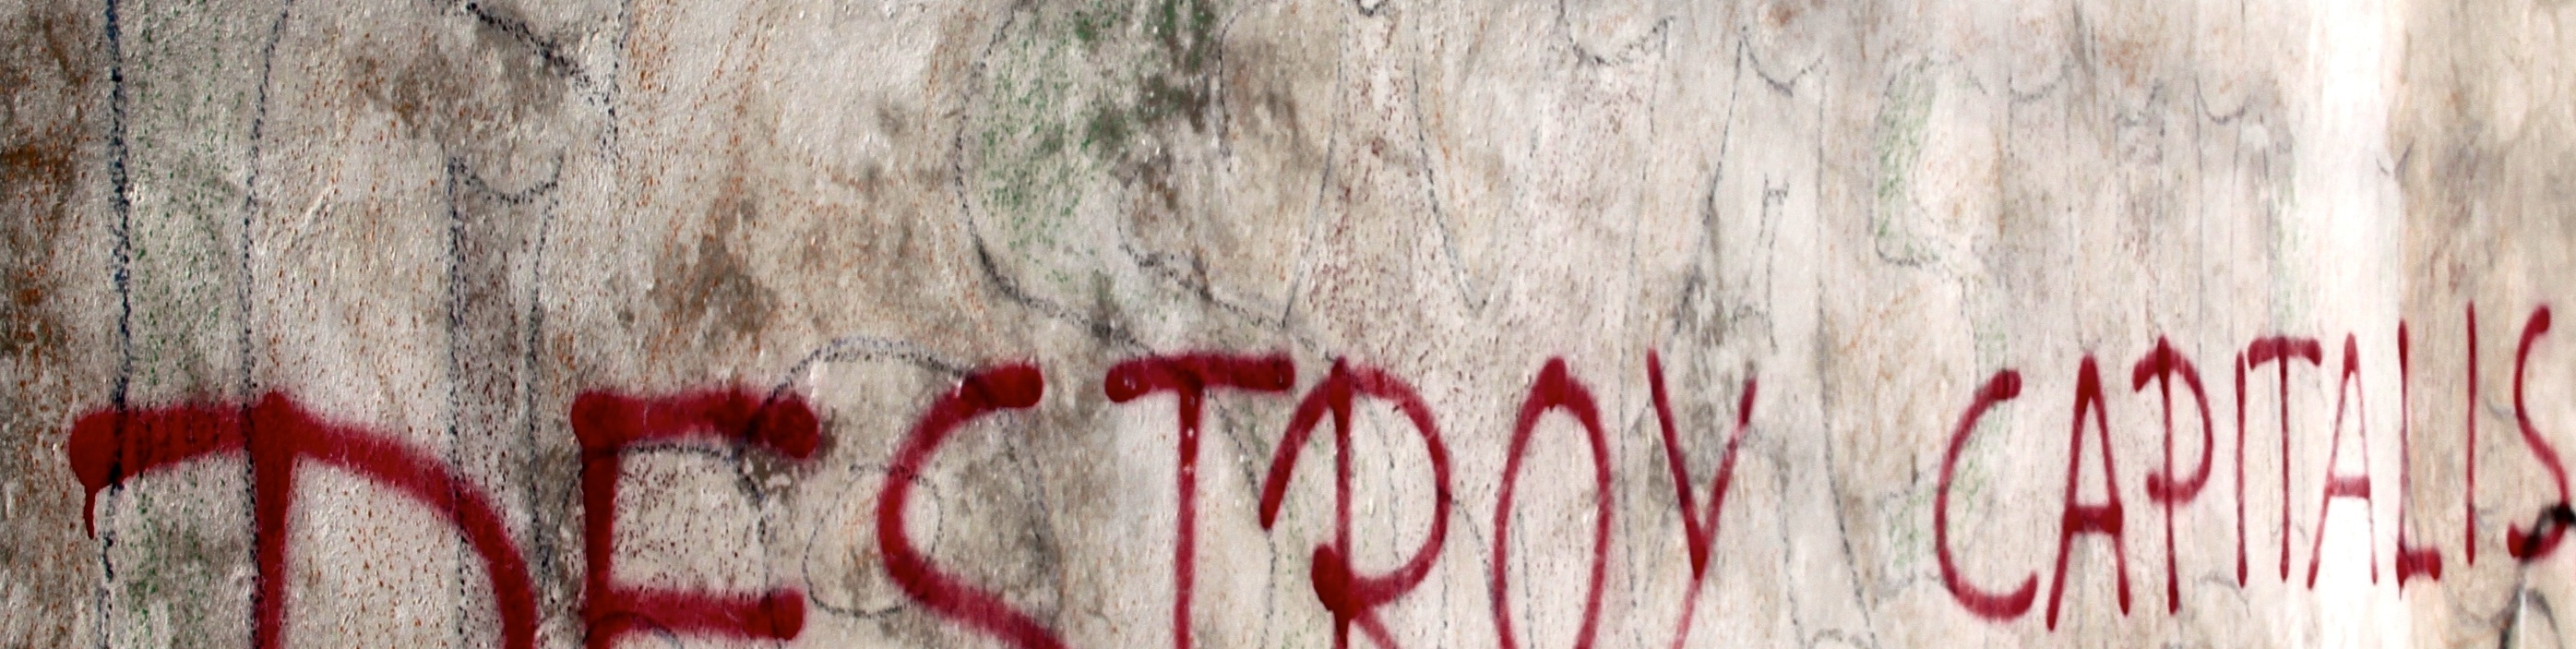 Graffito_Destroy_Capitalism_Steyr_16x9